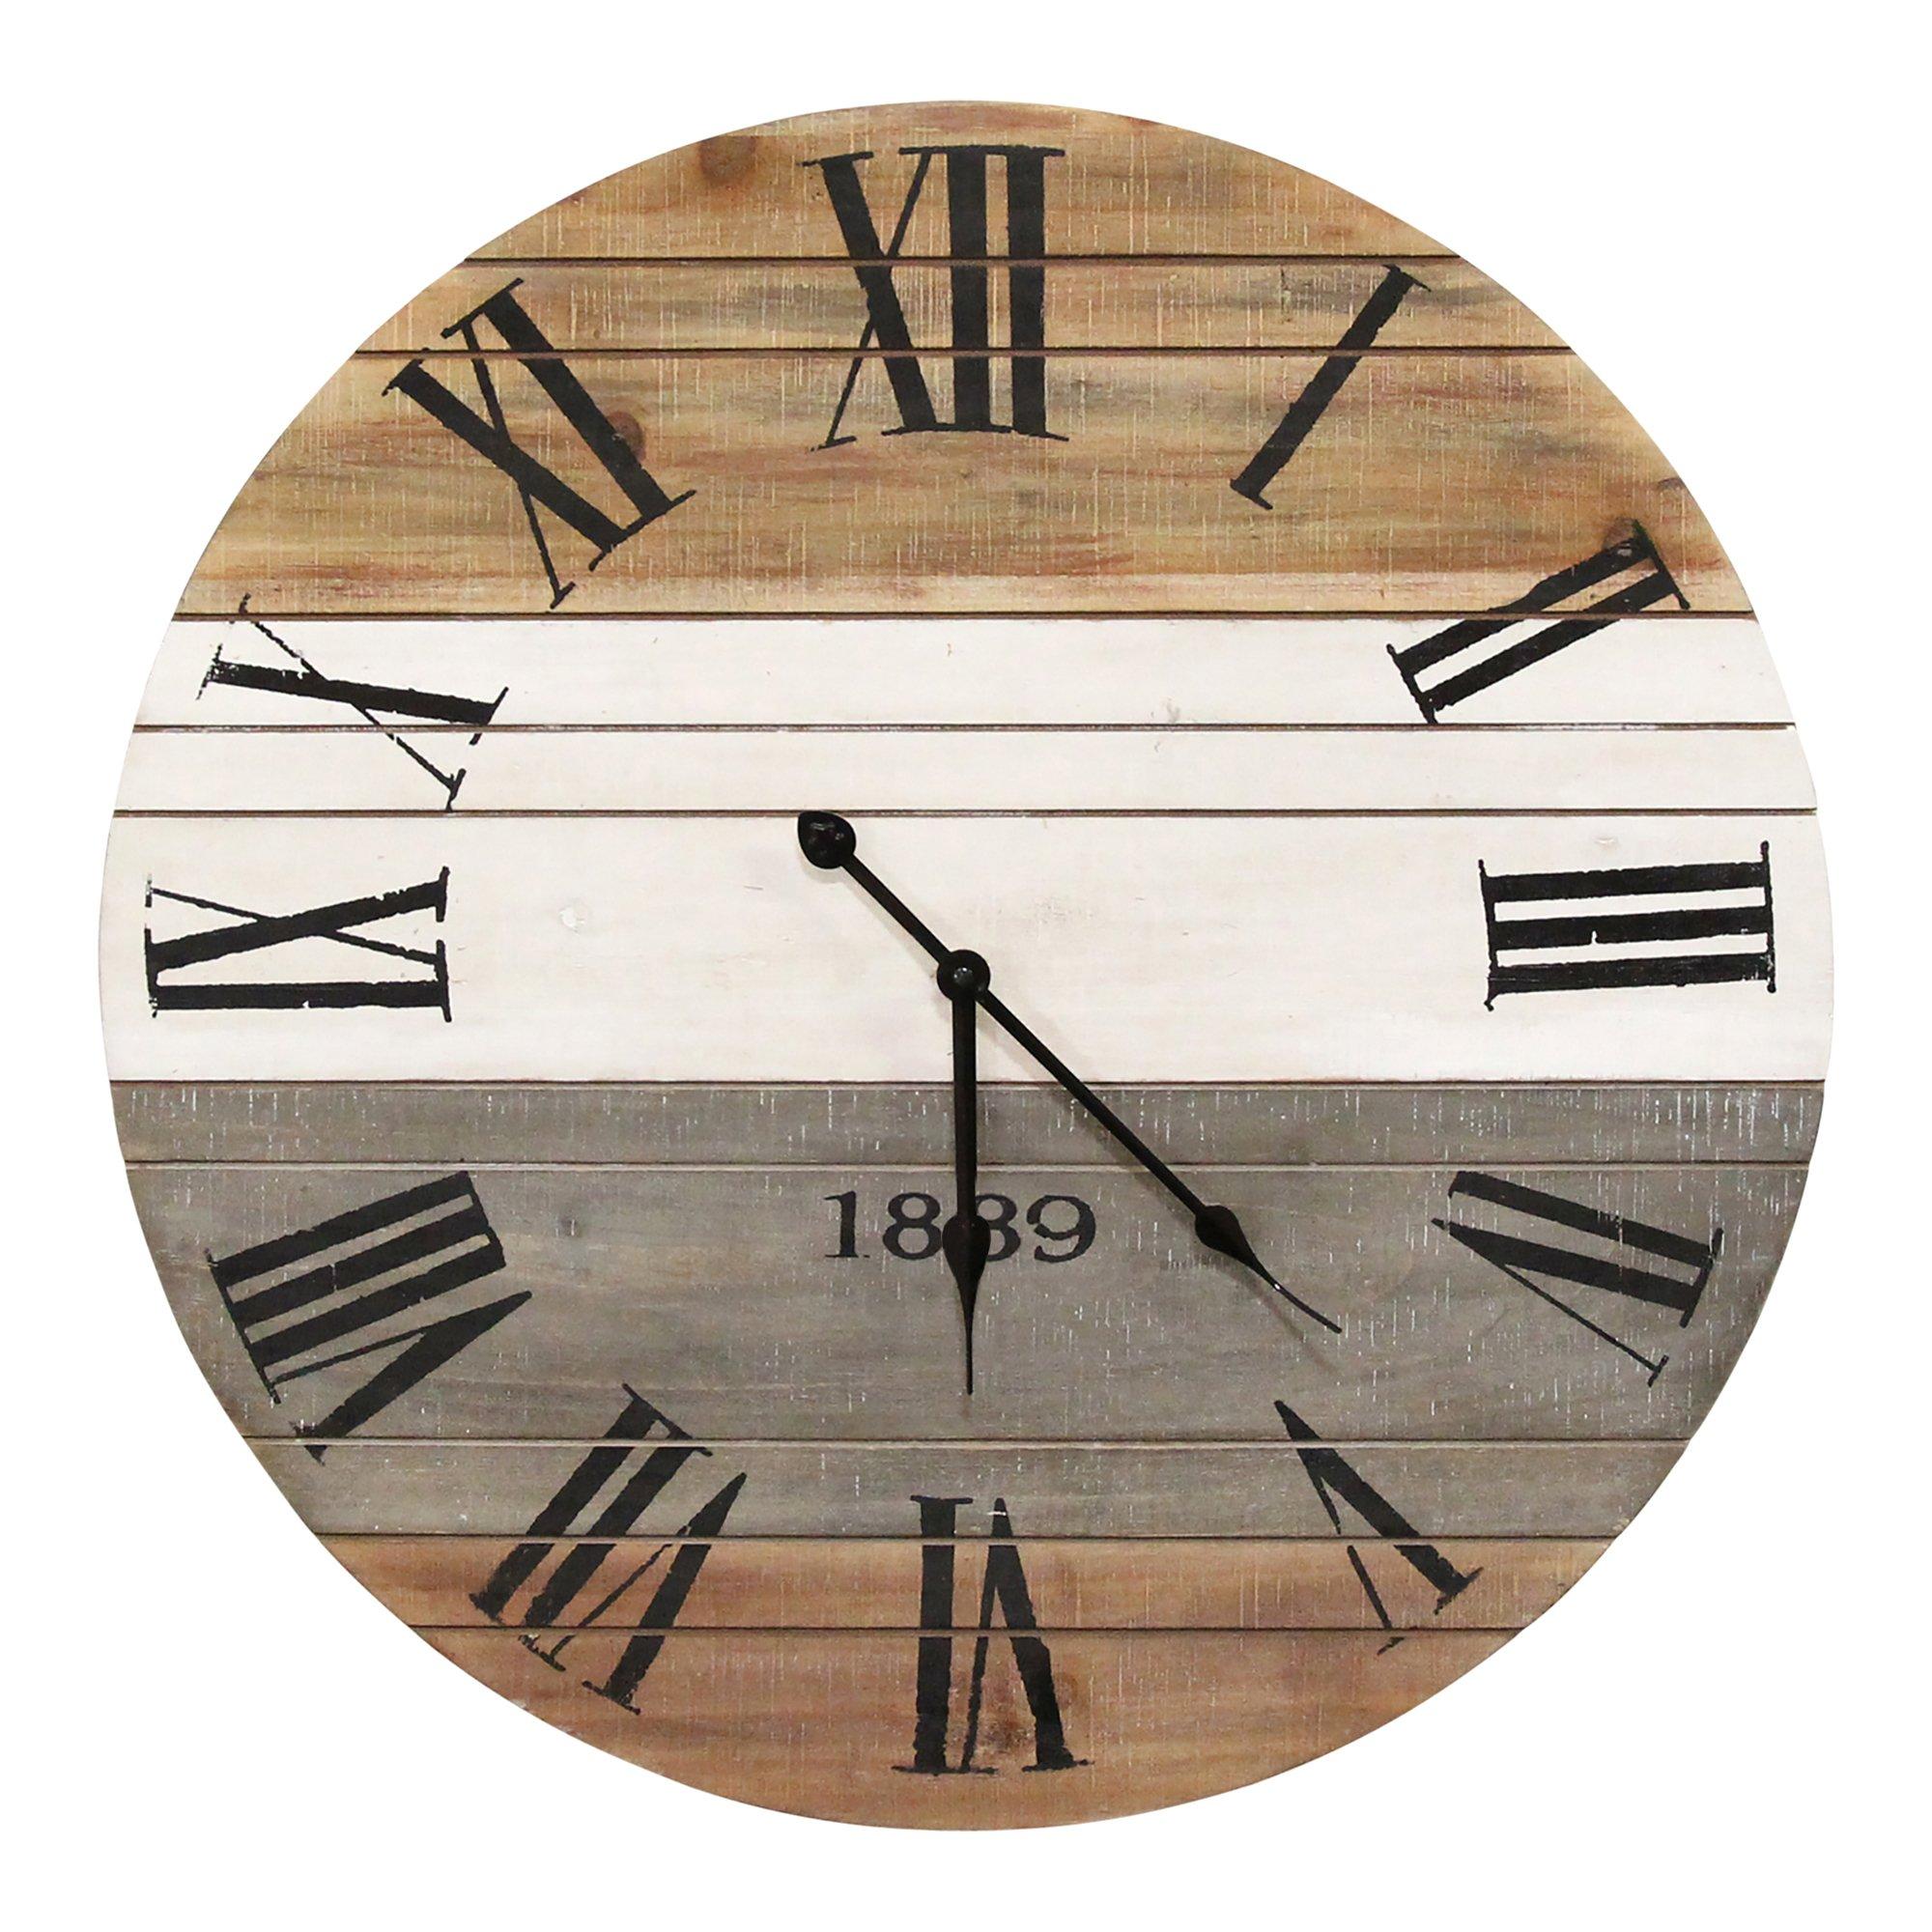 "21"" Round Distressed Wood-Grain Whitewash / Wall Clock"